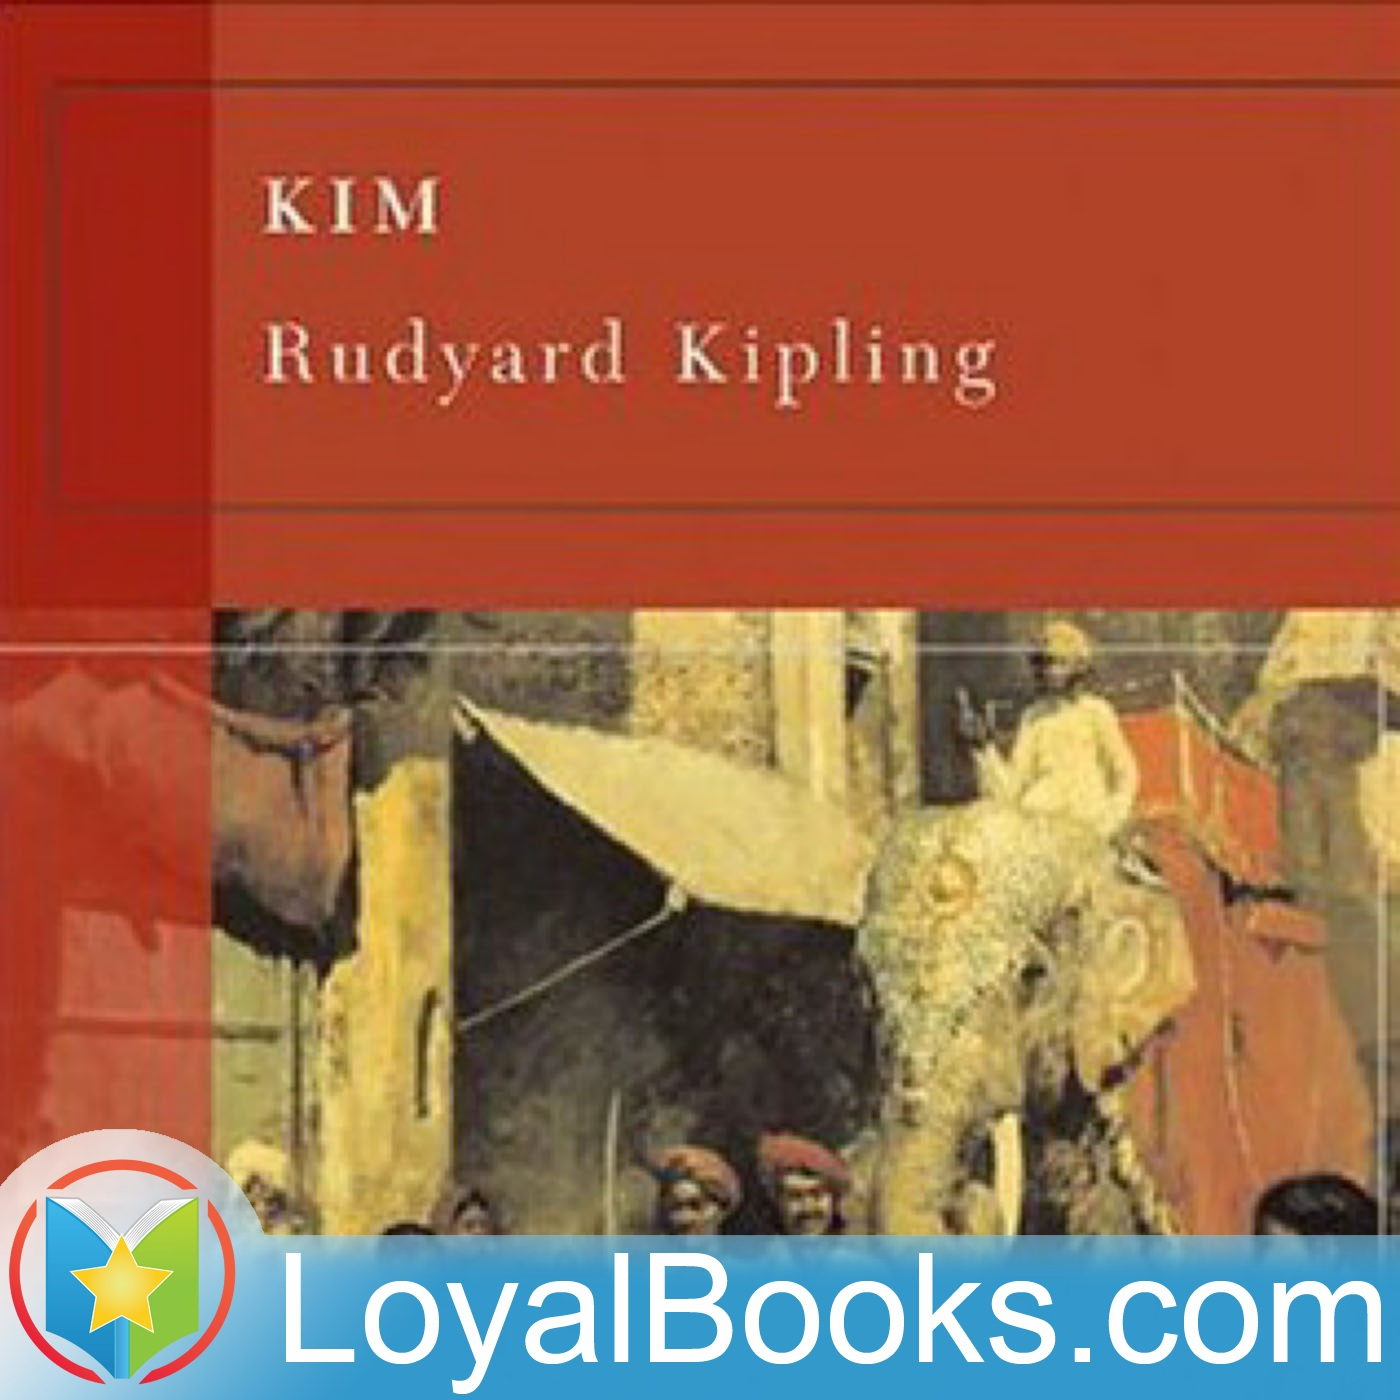 <![CDATA[Kim by Rudyard Kipling]]>